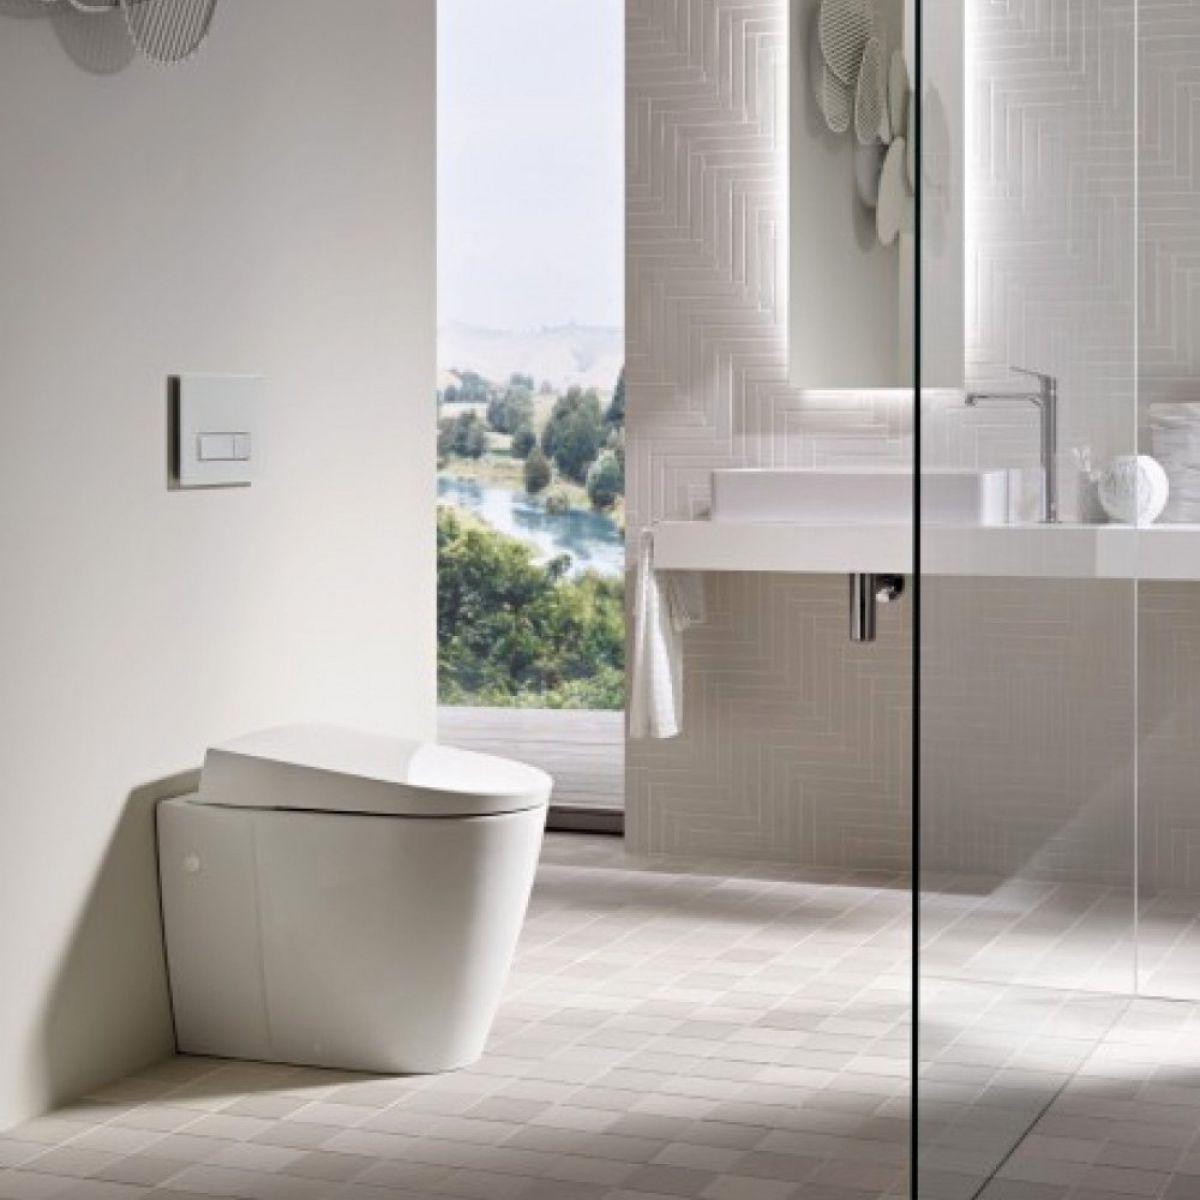 Geberit Aquaclean Sela Floor-standing Shower Toilet : UK Bathrooms